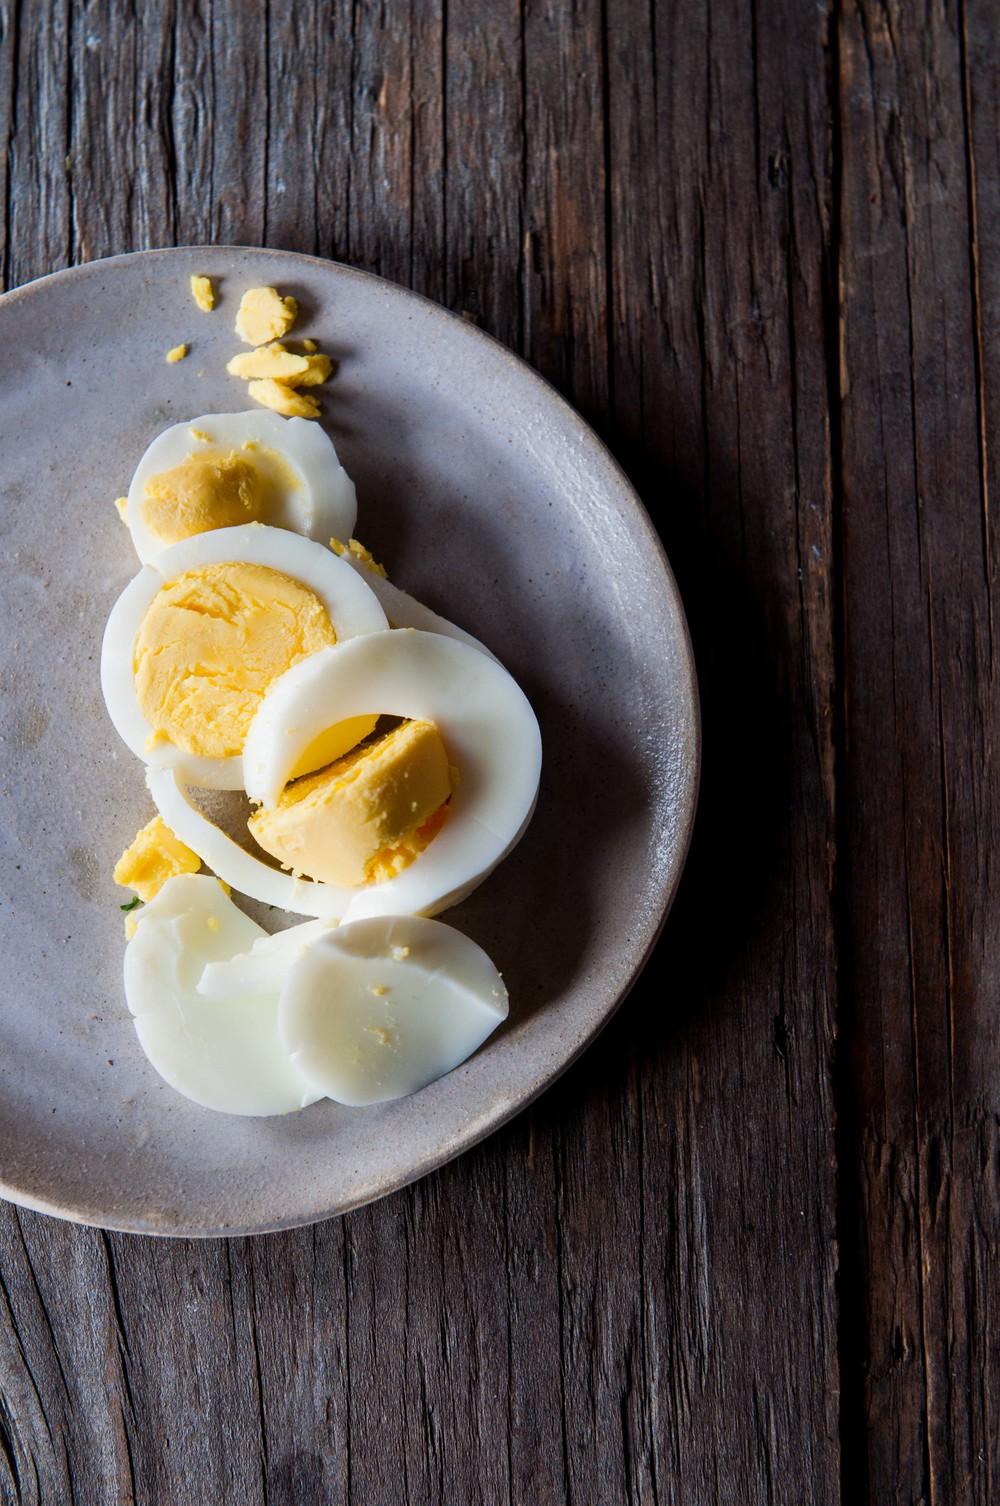 Boiled Egg Classique!